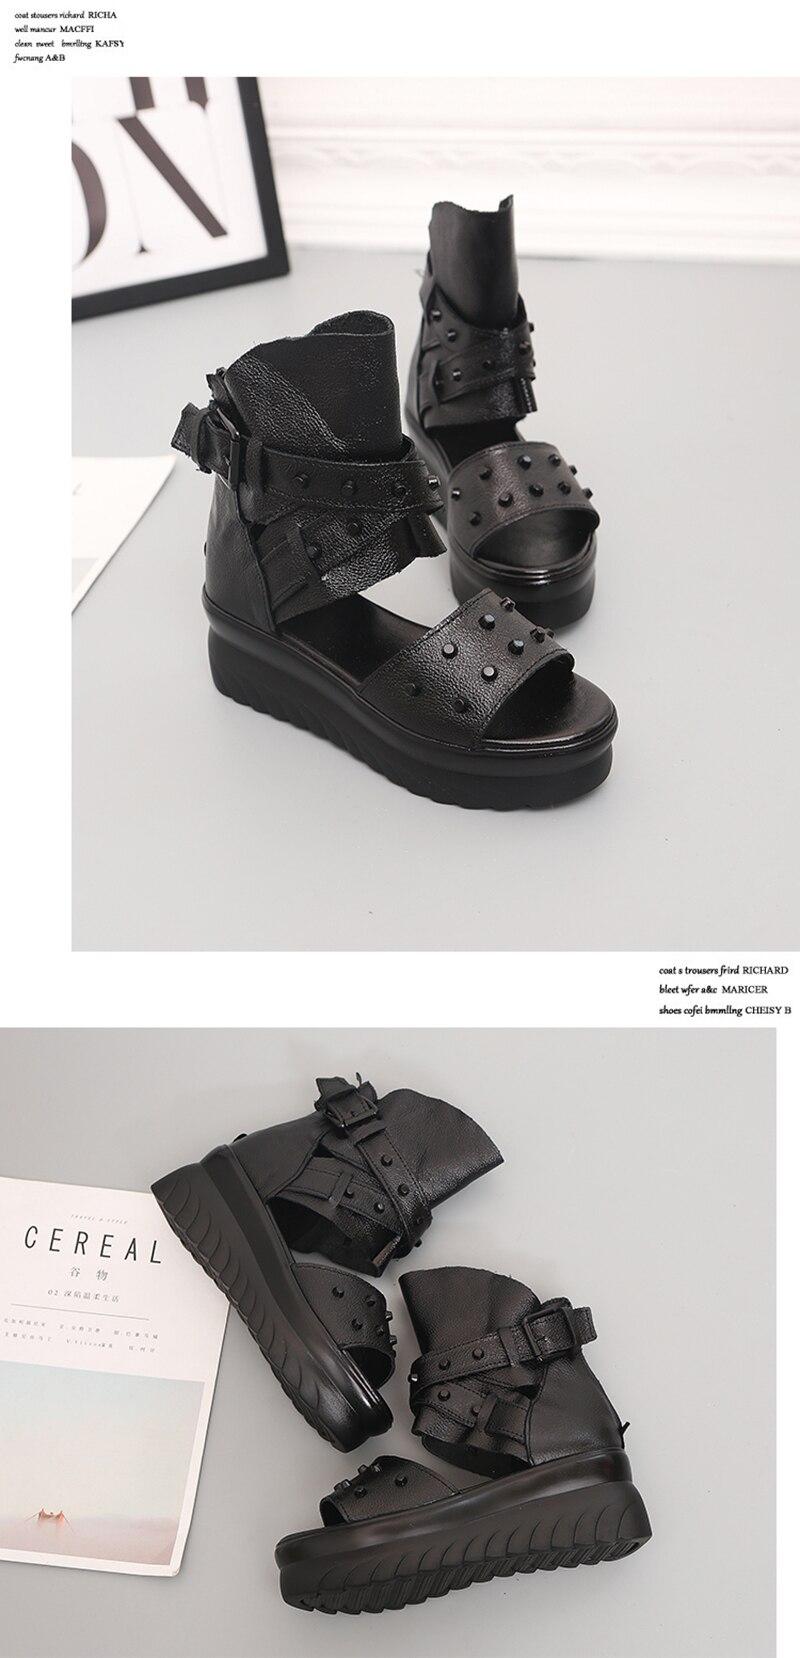 HTB1E1rZelKw3KVjSZFOq6yrDVXai ADBOOV Genuine Leather Platform Sandals Women Summer Wedges Shoes For Women Sandalias De Verano Para Mujer Size 35-43